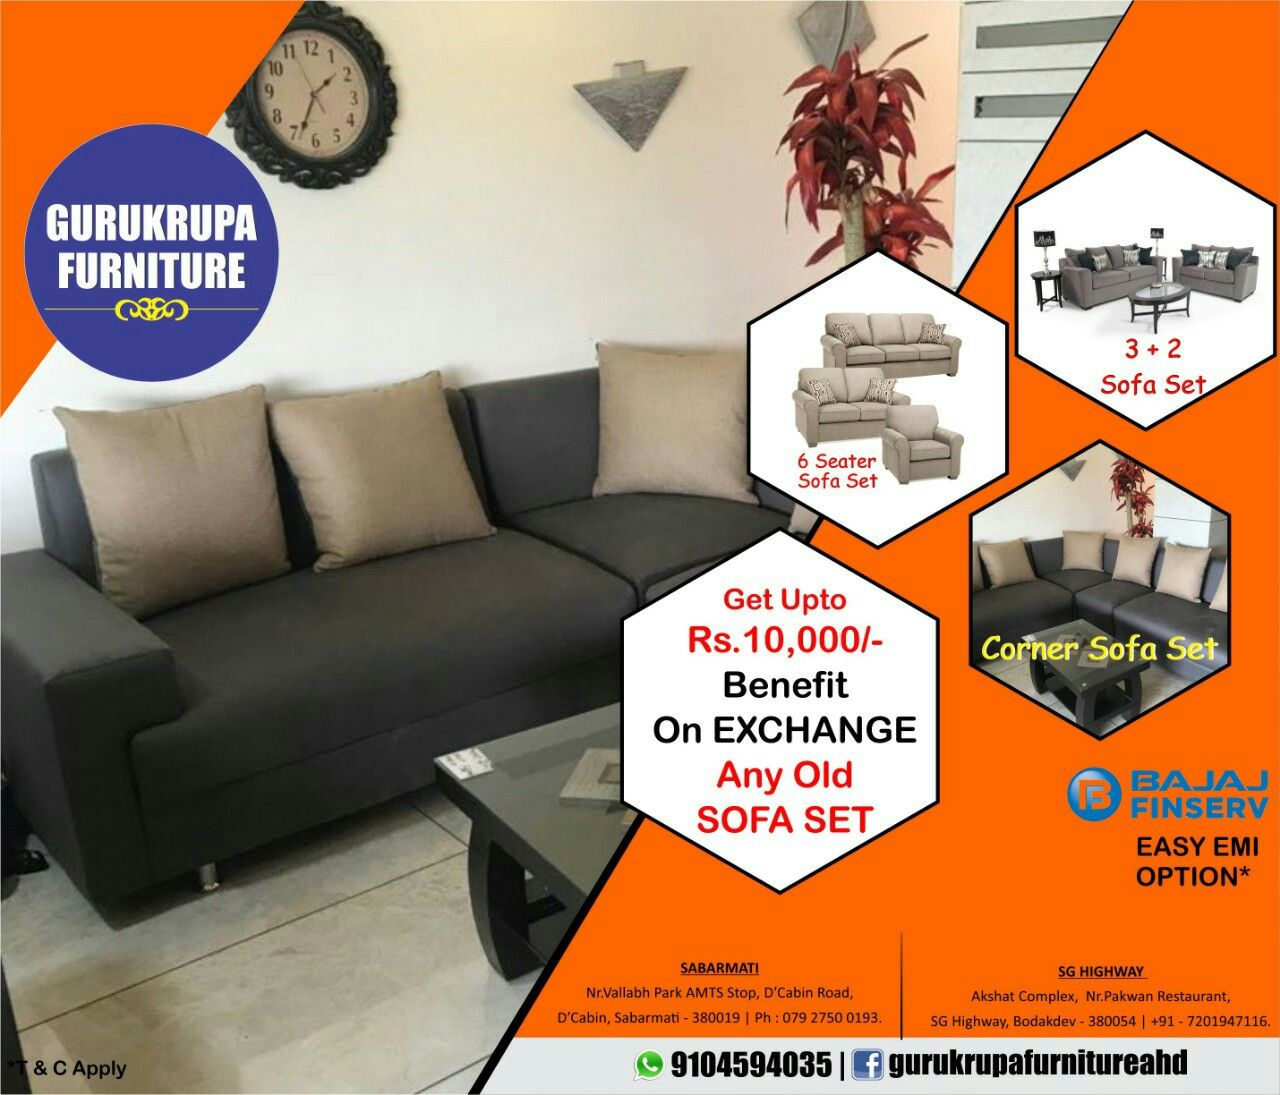 Get Upto Rs 10 000 Benefit On Exchange Old Sofa Set 3 2 Sofa Set Corner Sofa Set 6 Seater Sofa Set Start Now Rs 1 Corner Sofa Set Sofa Set Corner Sofa